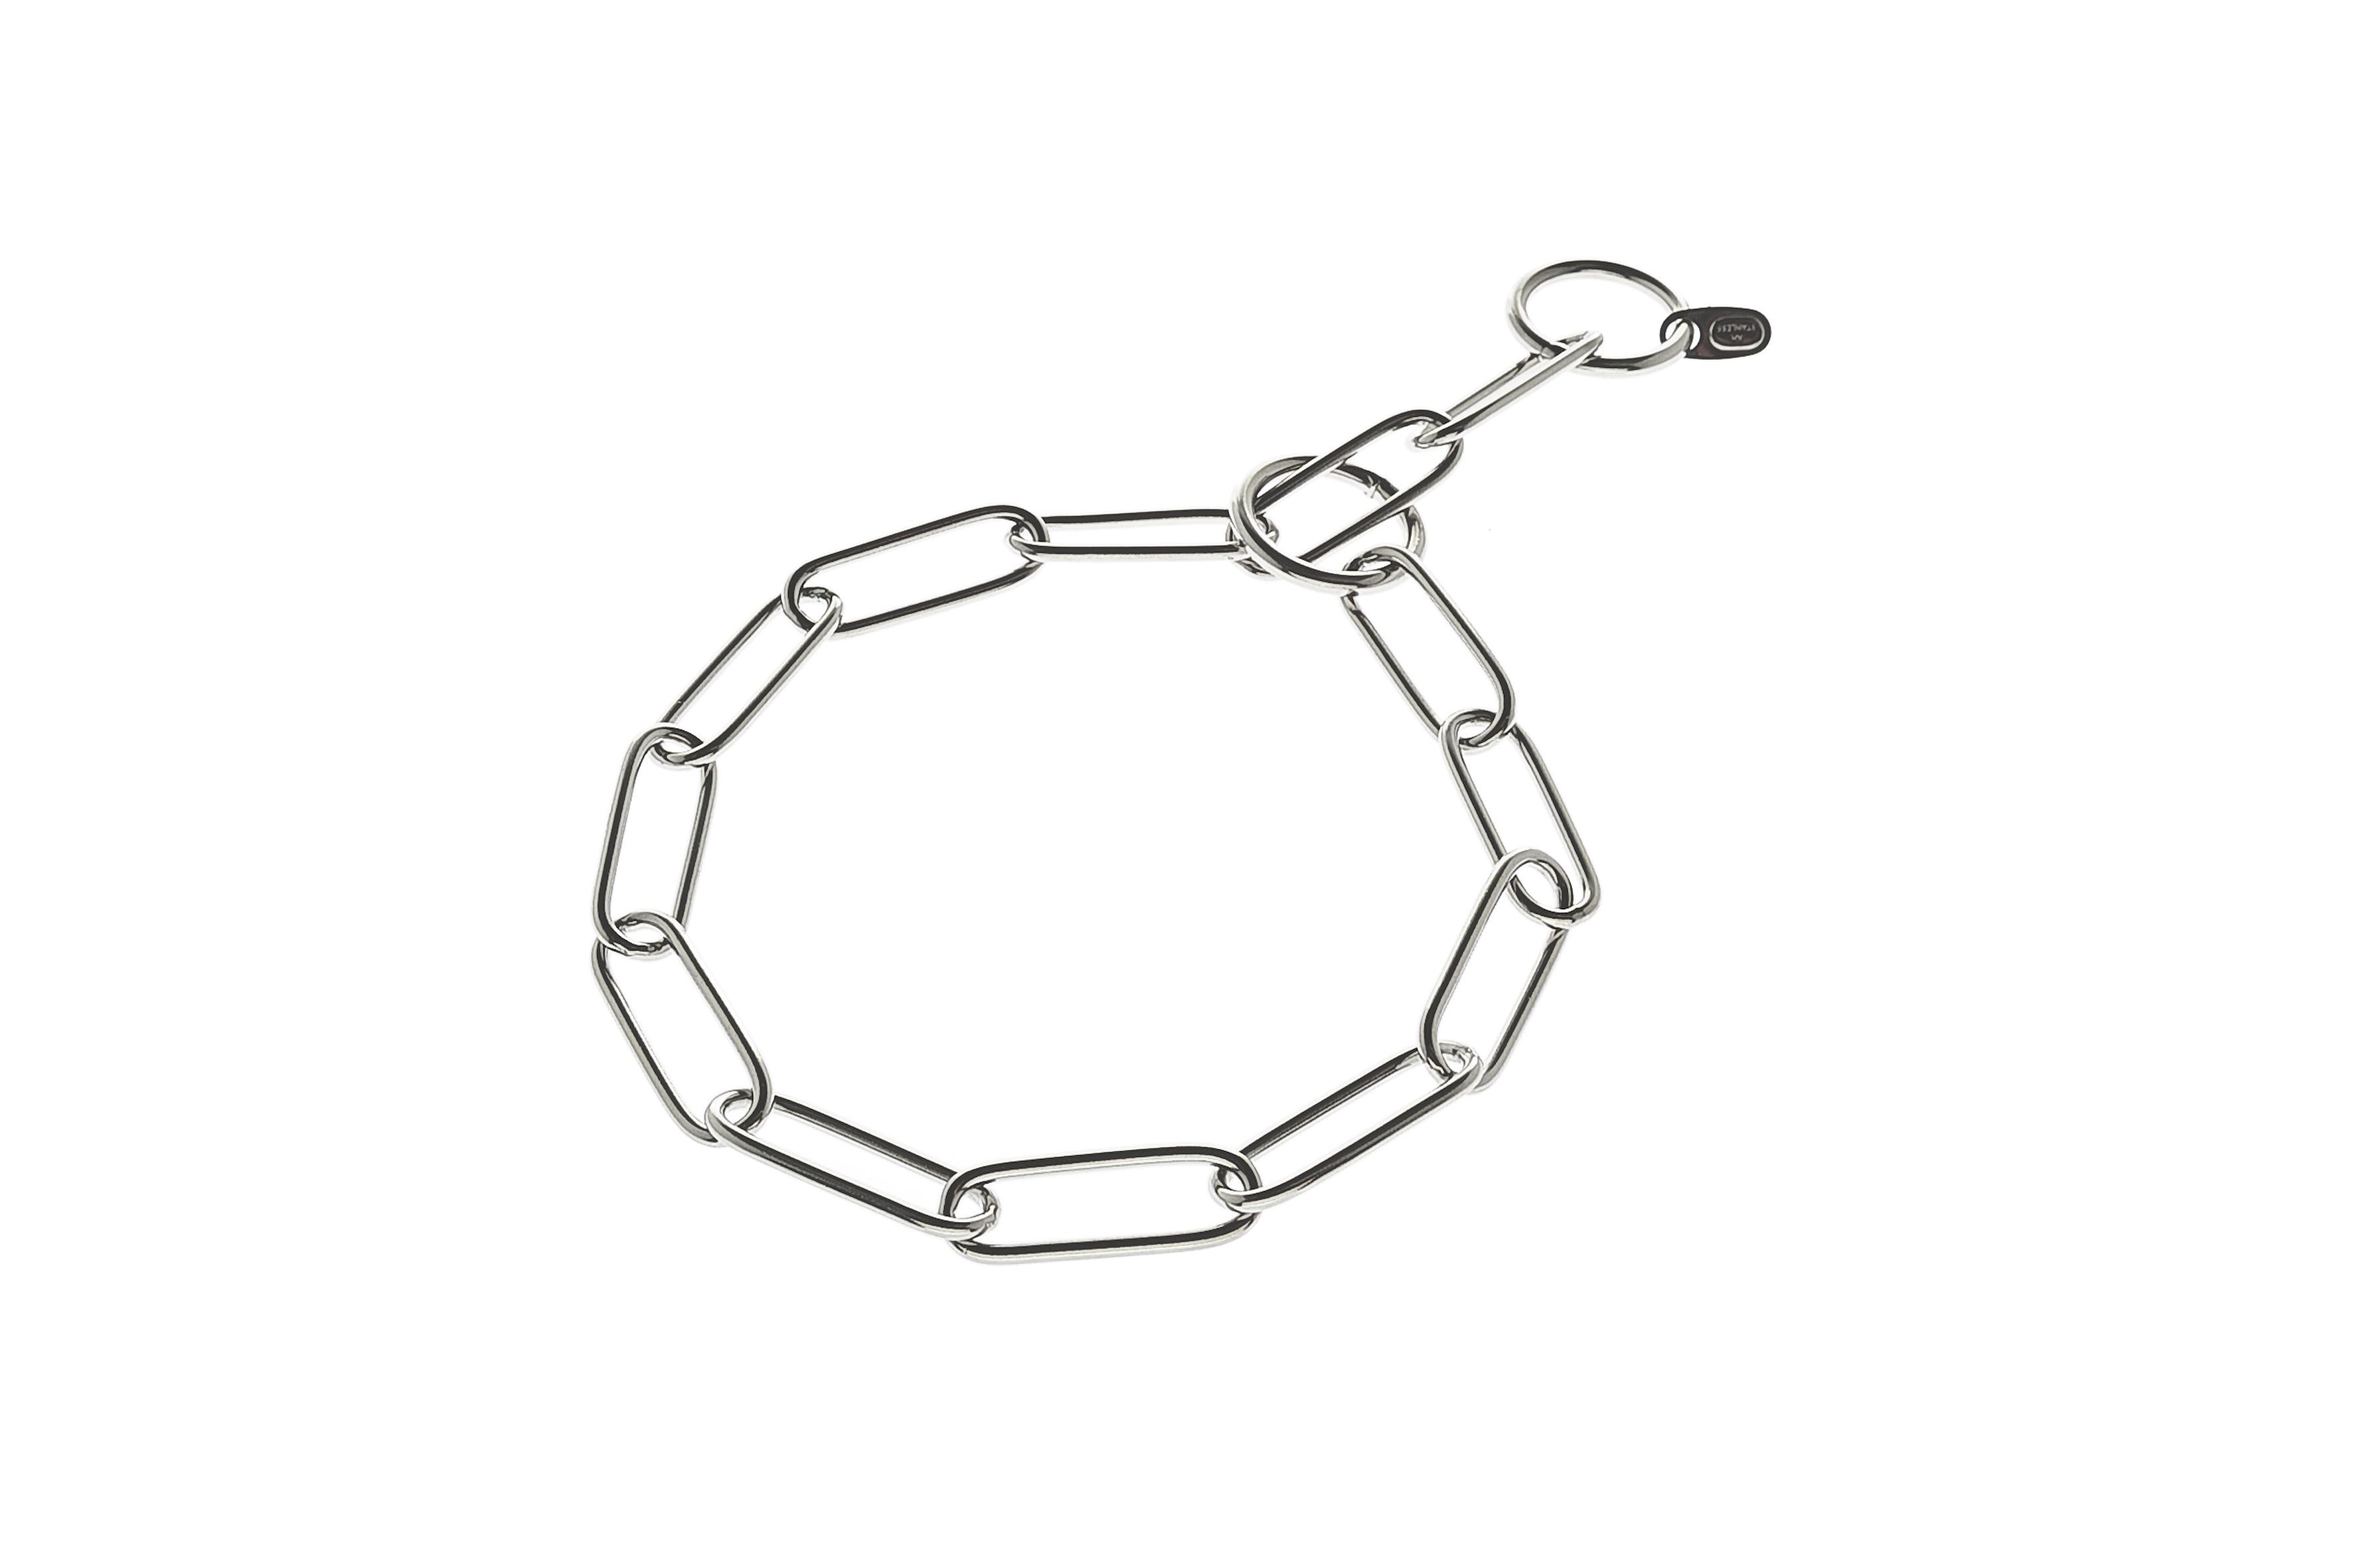 Steel Chain Chock